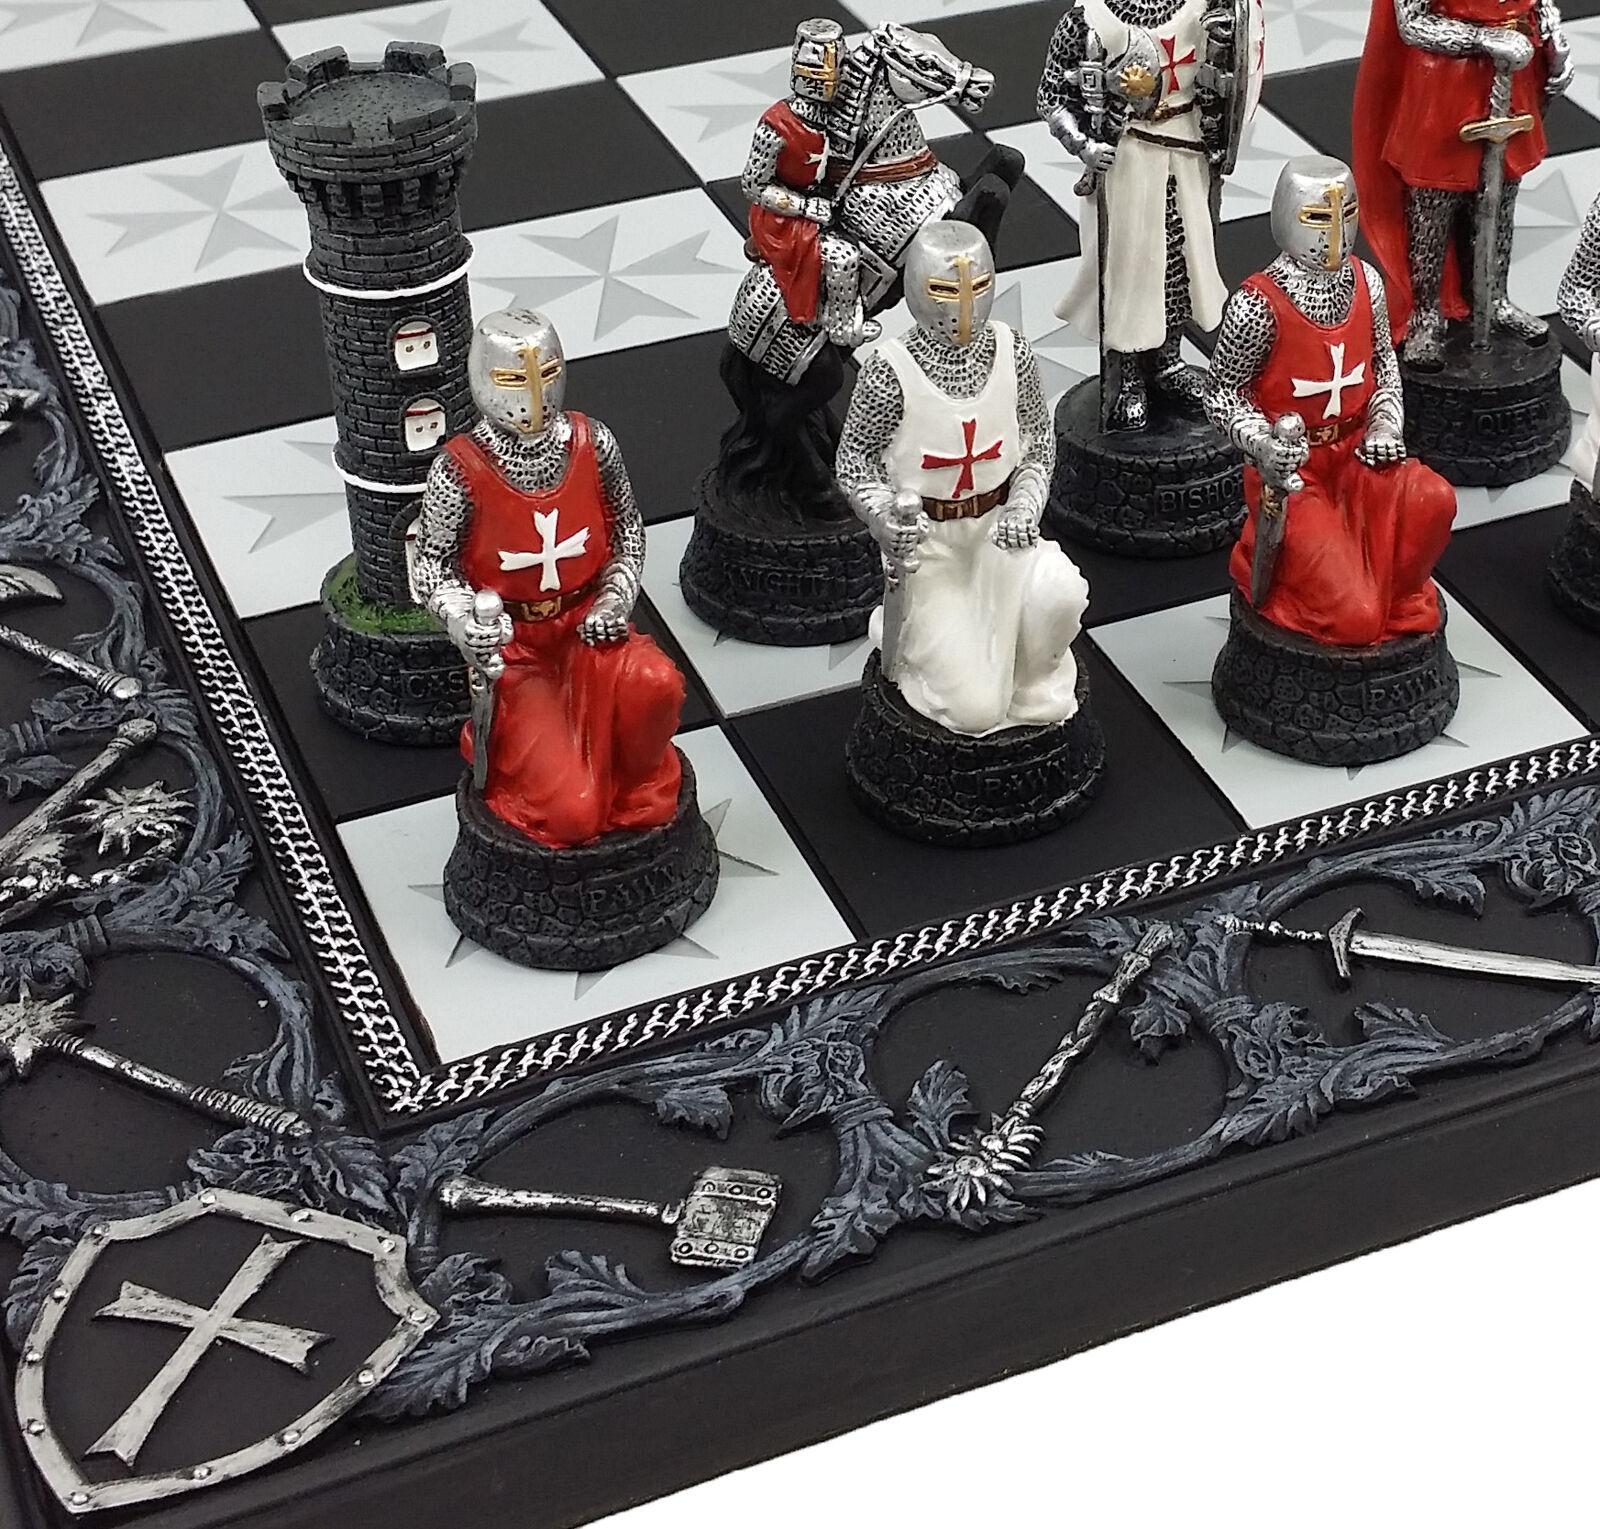 Medieval Times Crusades rosso & bianca Armorosso Maltese Knights Chess Set 17  tavola